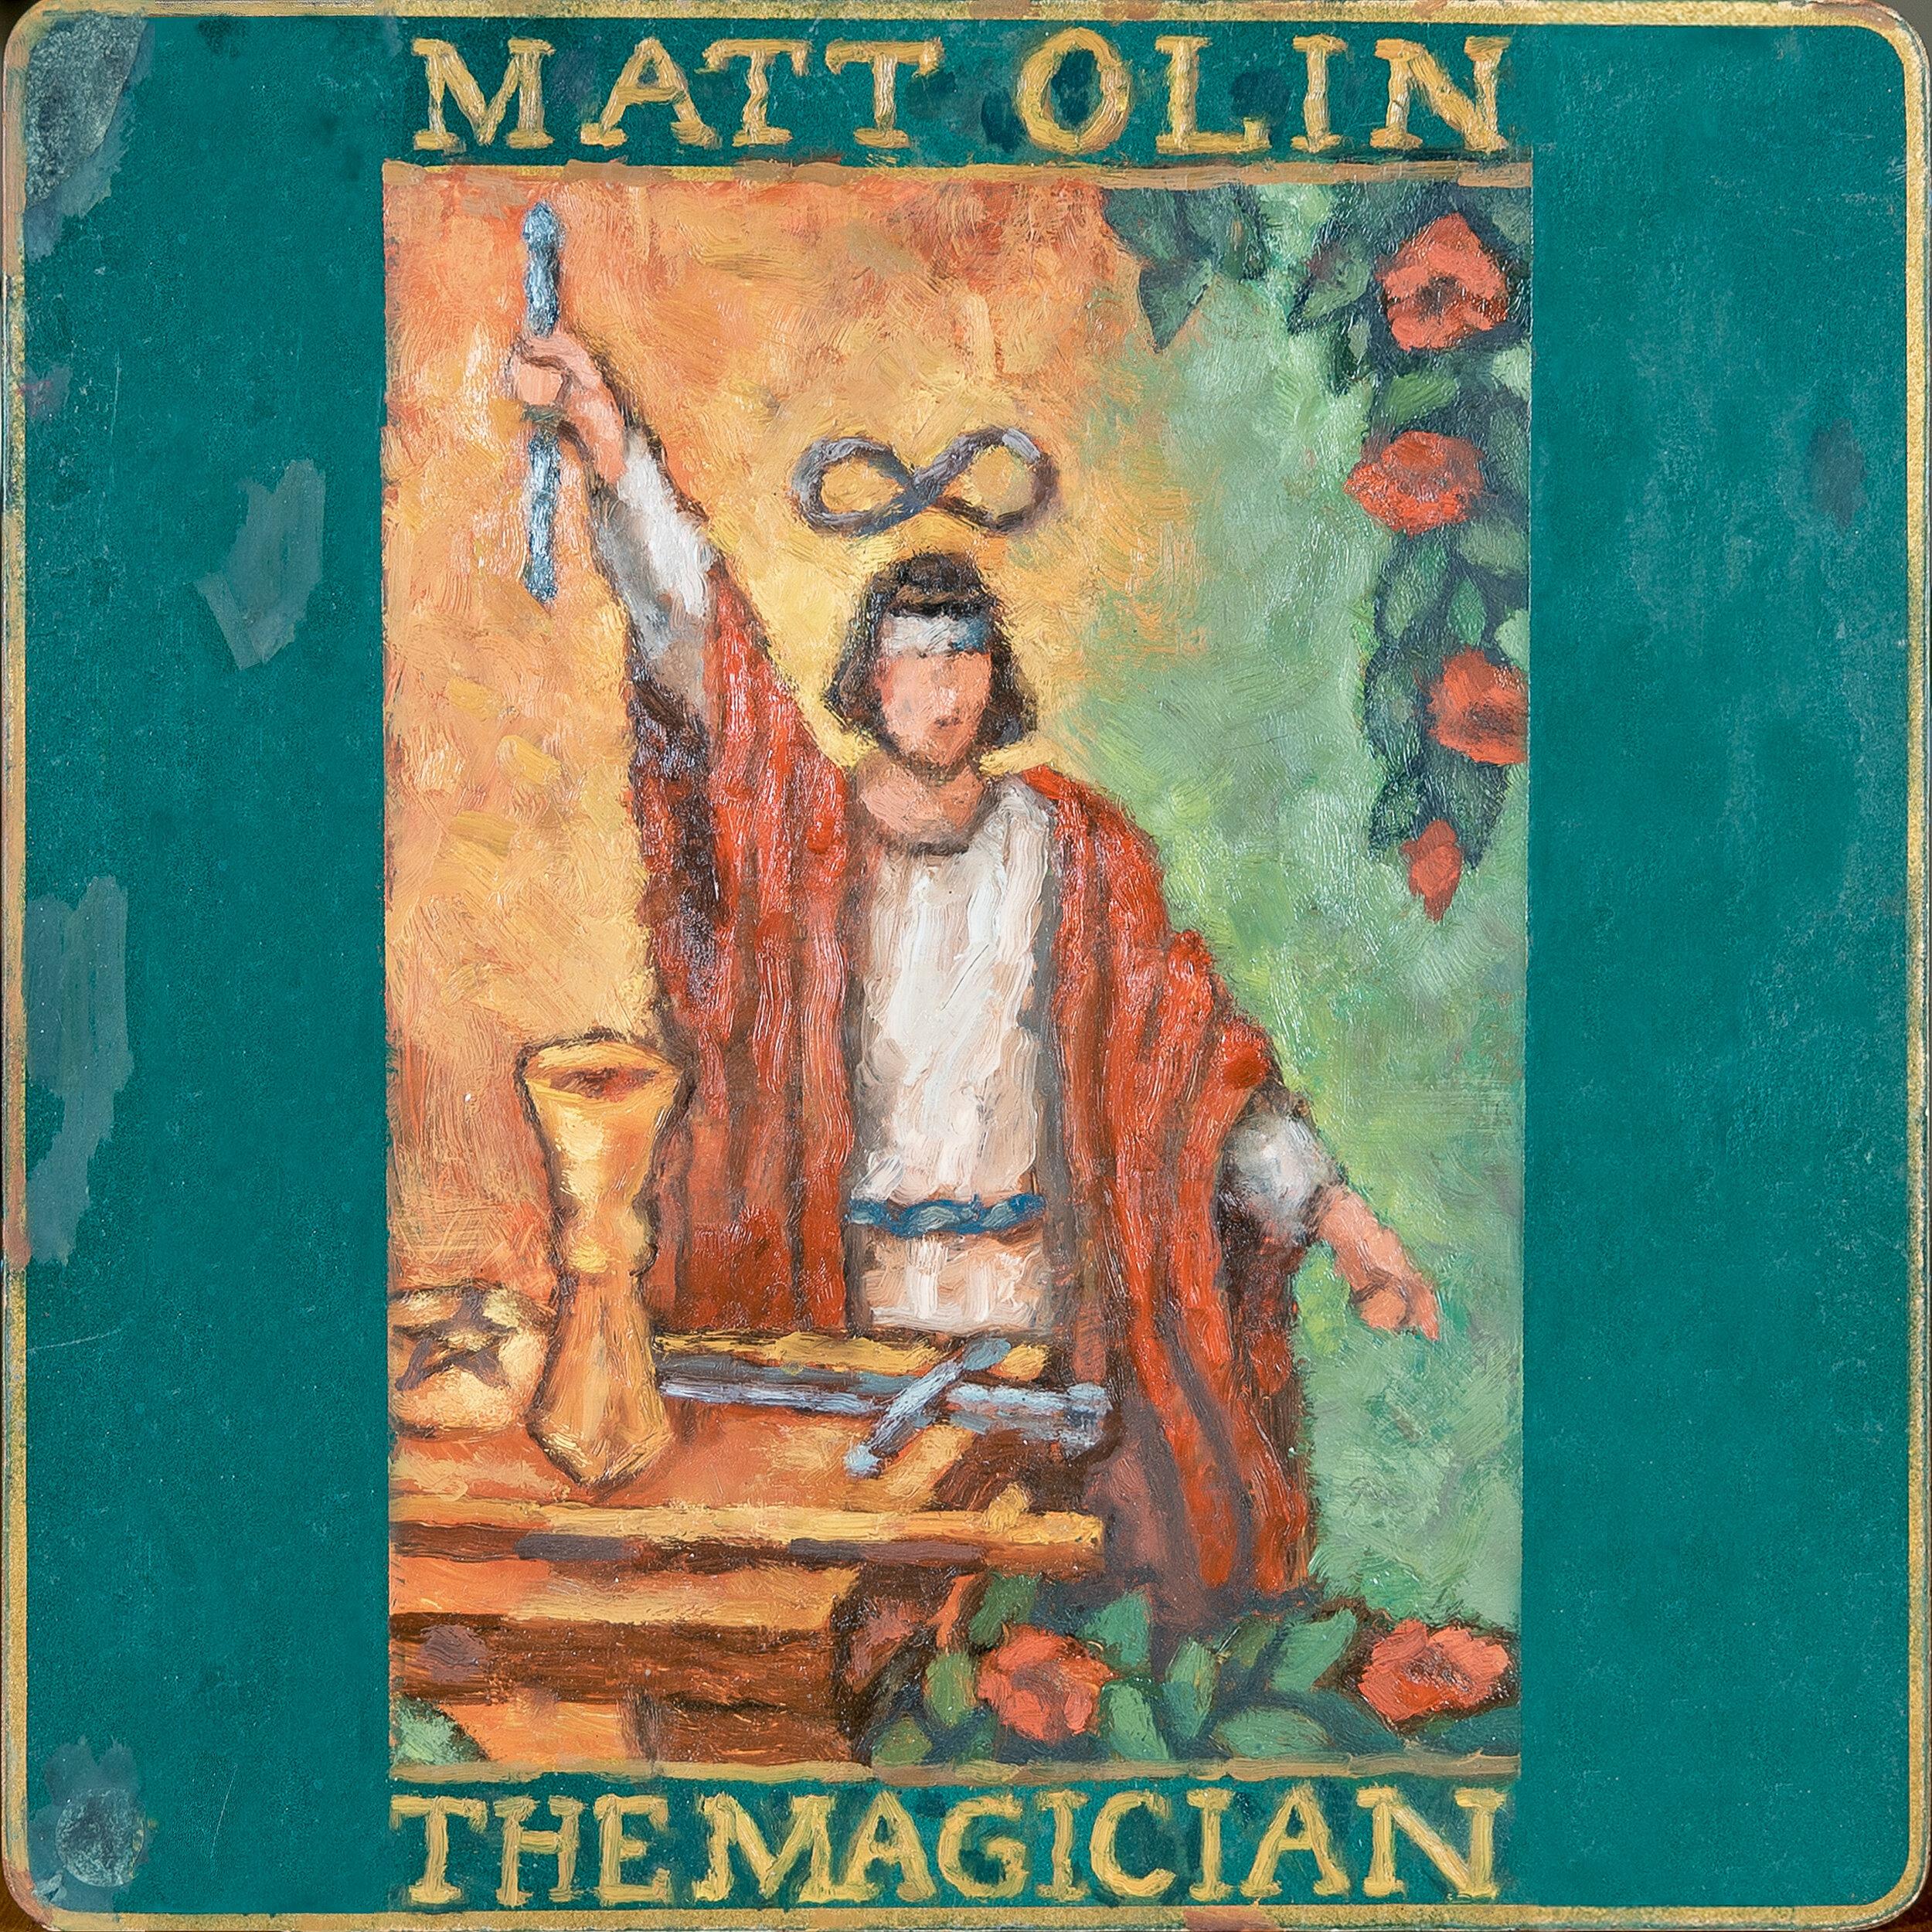 Matt-Olin_The-Magician_Album-Cover-2.jpg